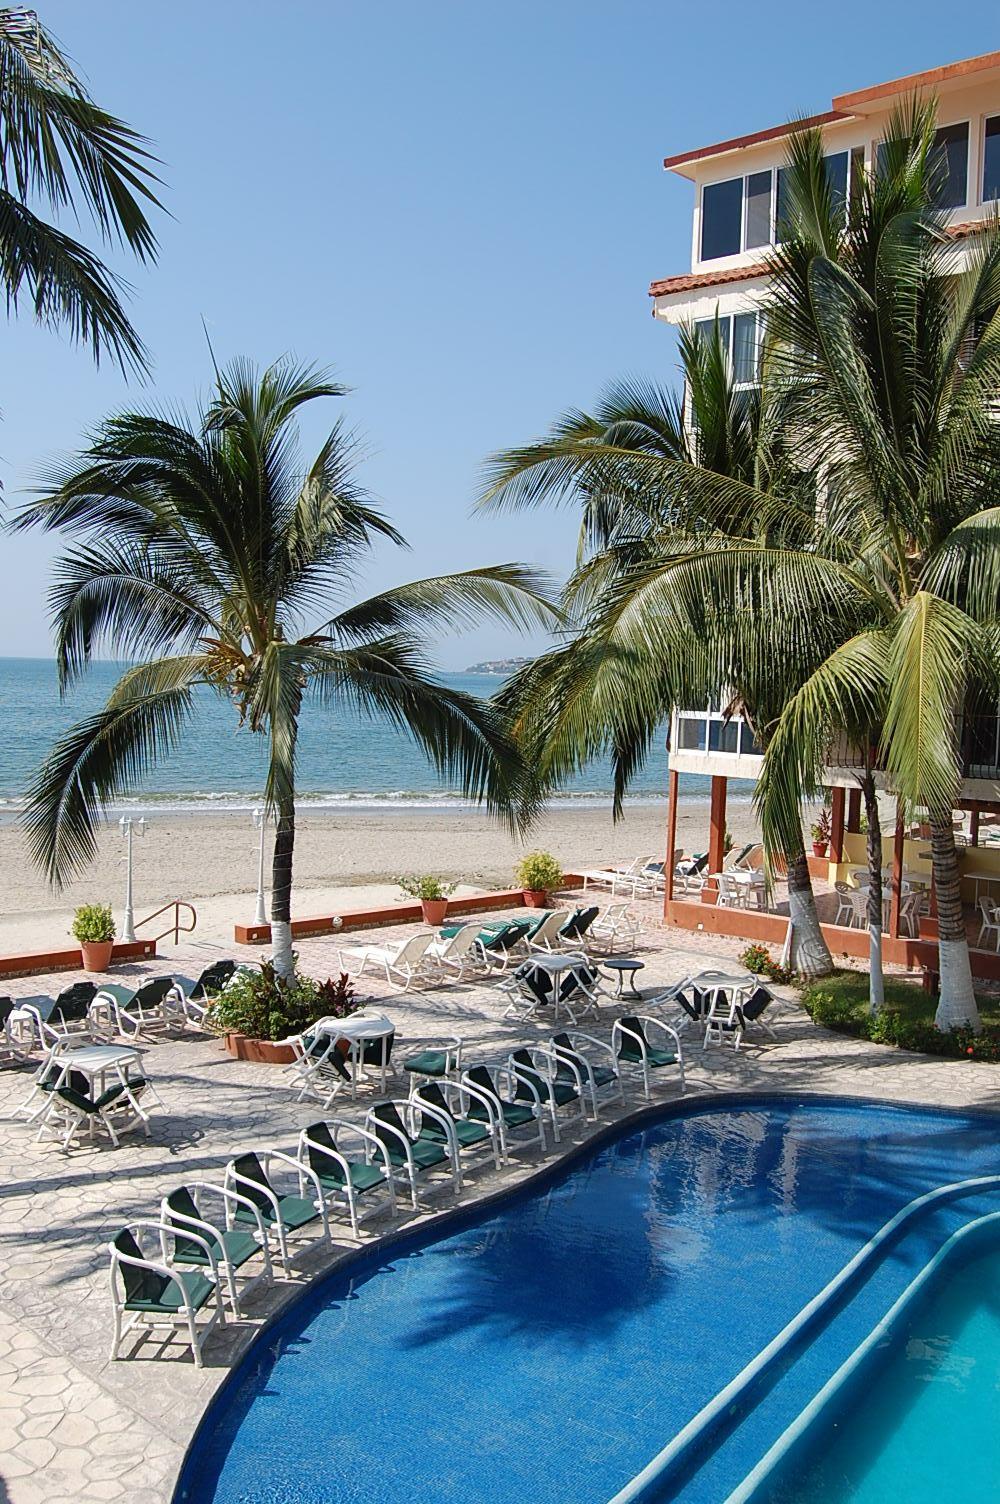 Beachfront 3 bedroom, Bucerias town